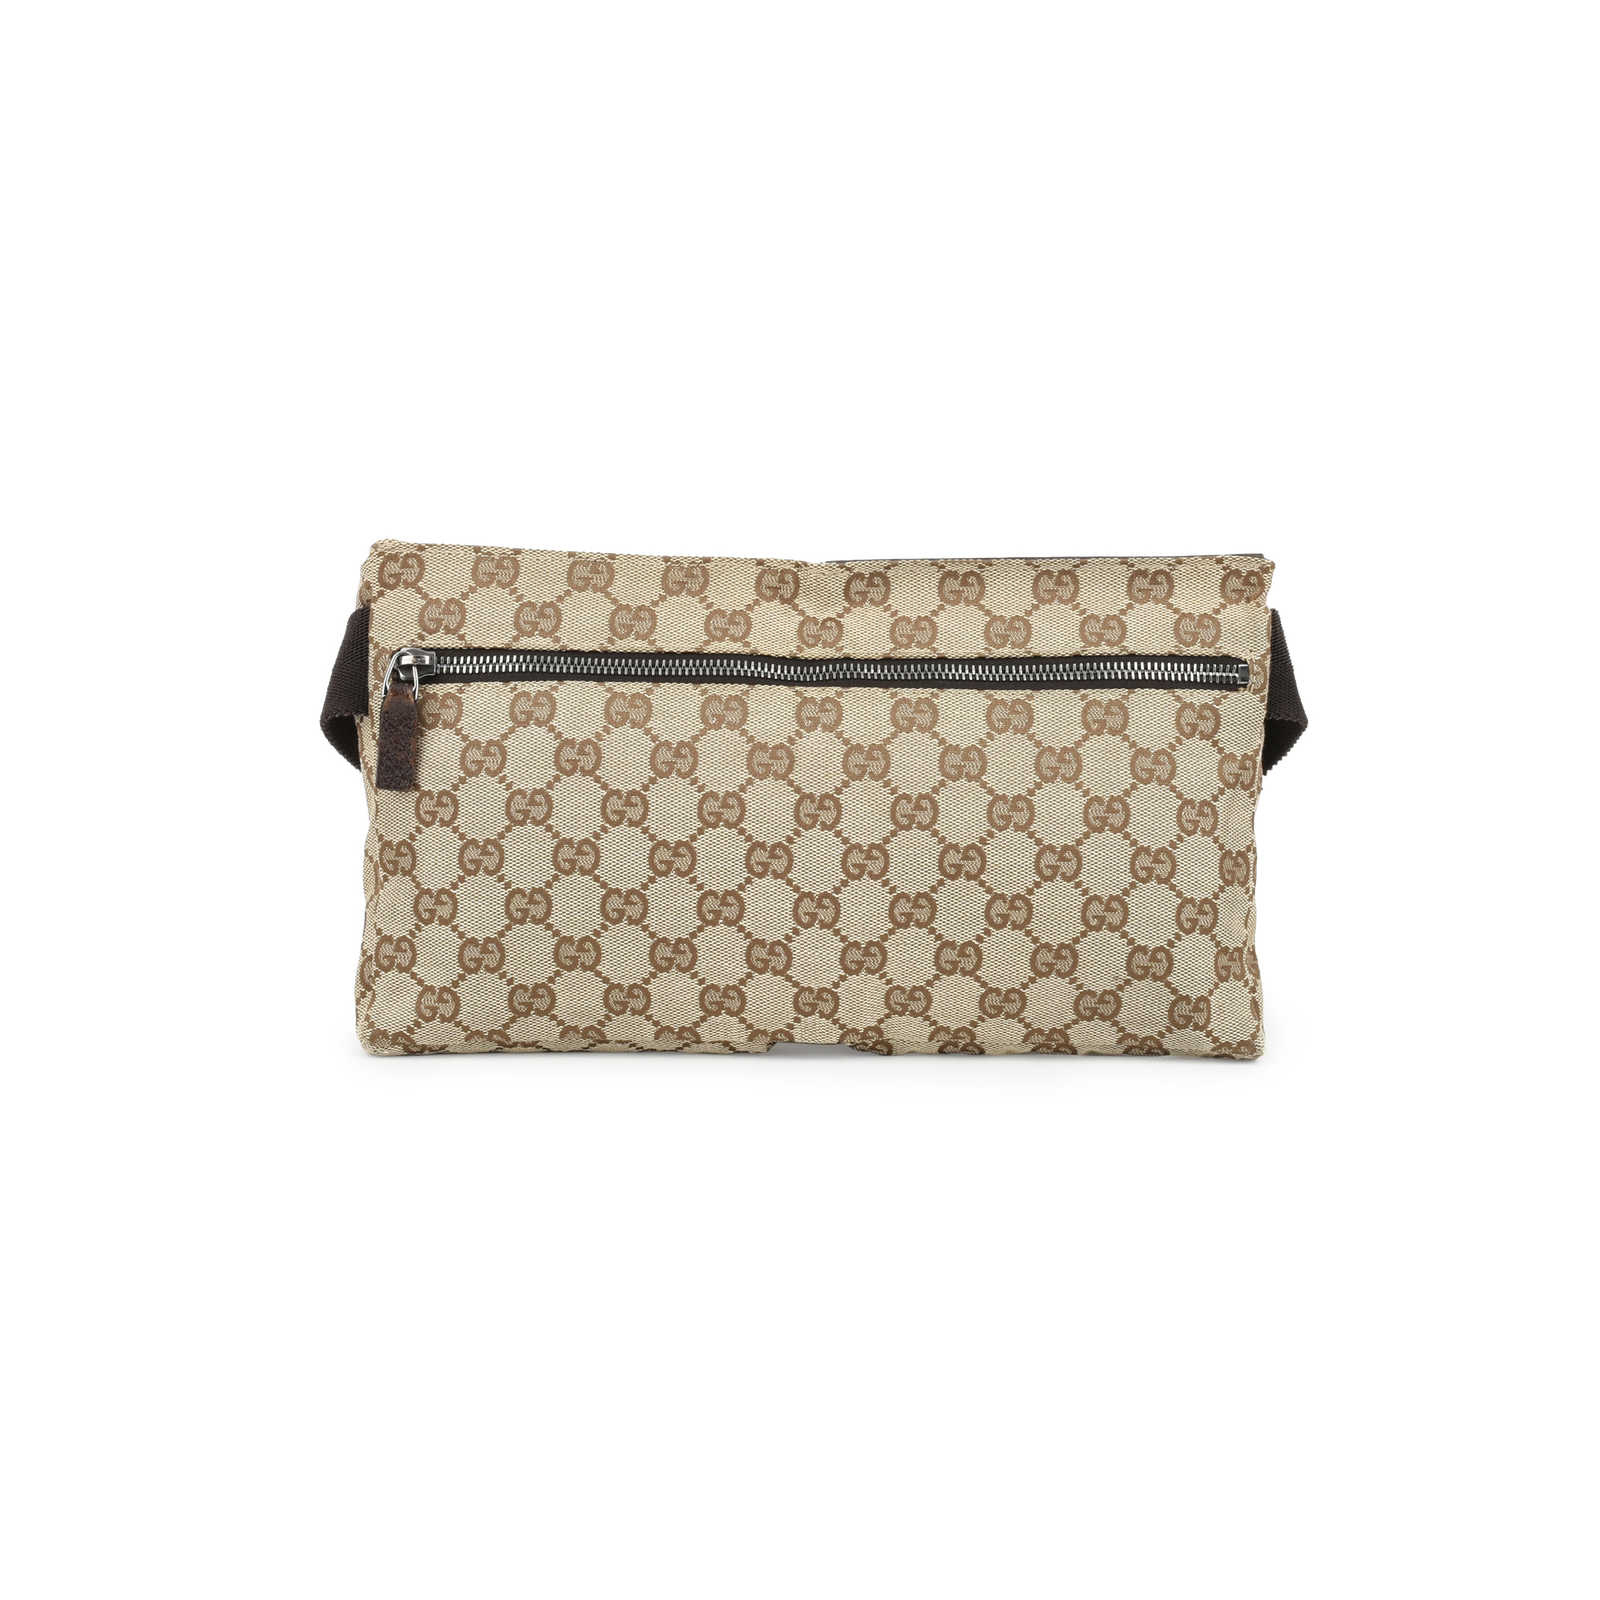 4171d4be8db ... Authentic Second Hand Gucci Monogram Belt Bag (PSS-436-00006) -  Thumbnail ...